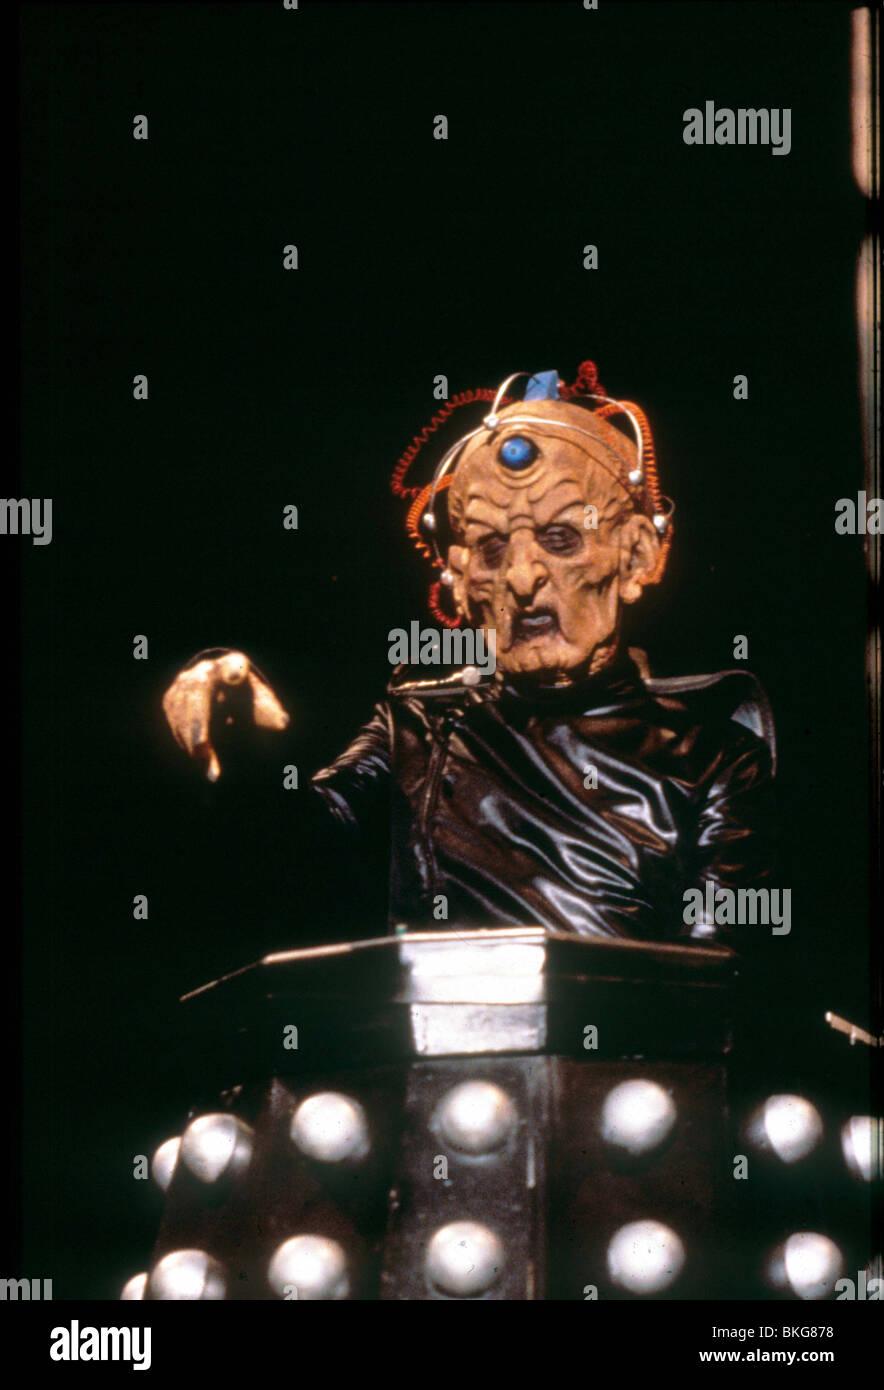 DR WHO (TV) DESTINY OF THE DALEKS DOCTOR WHO DWDO 001 - Stock Image